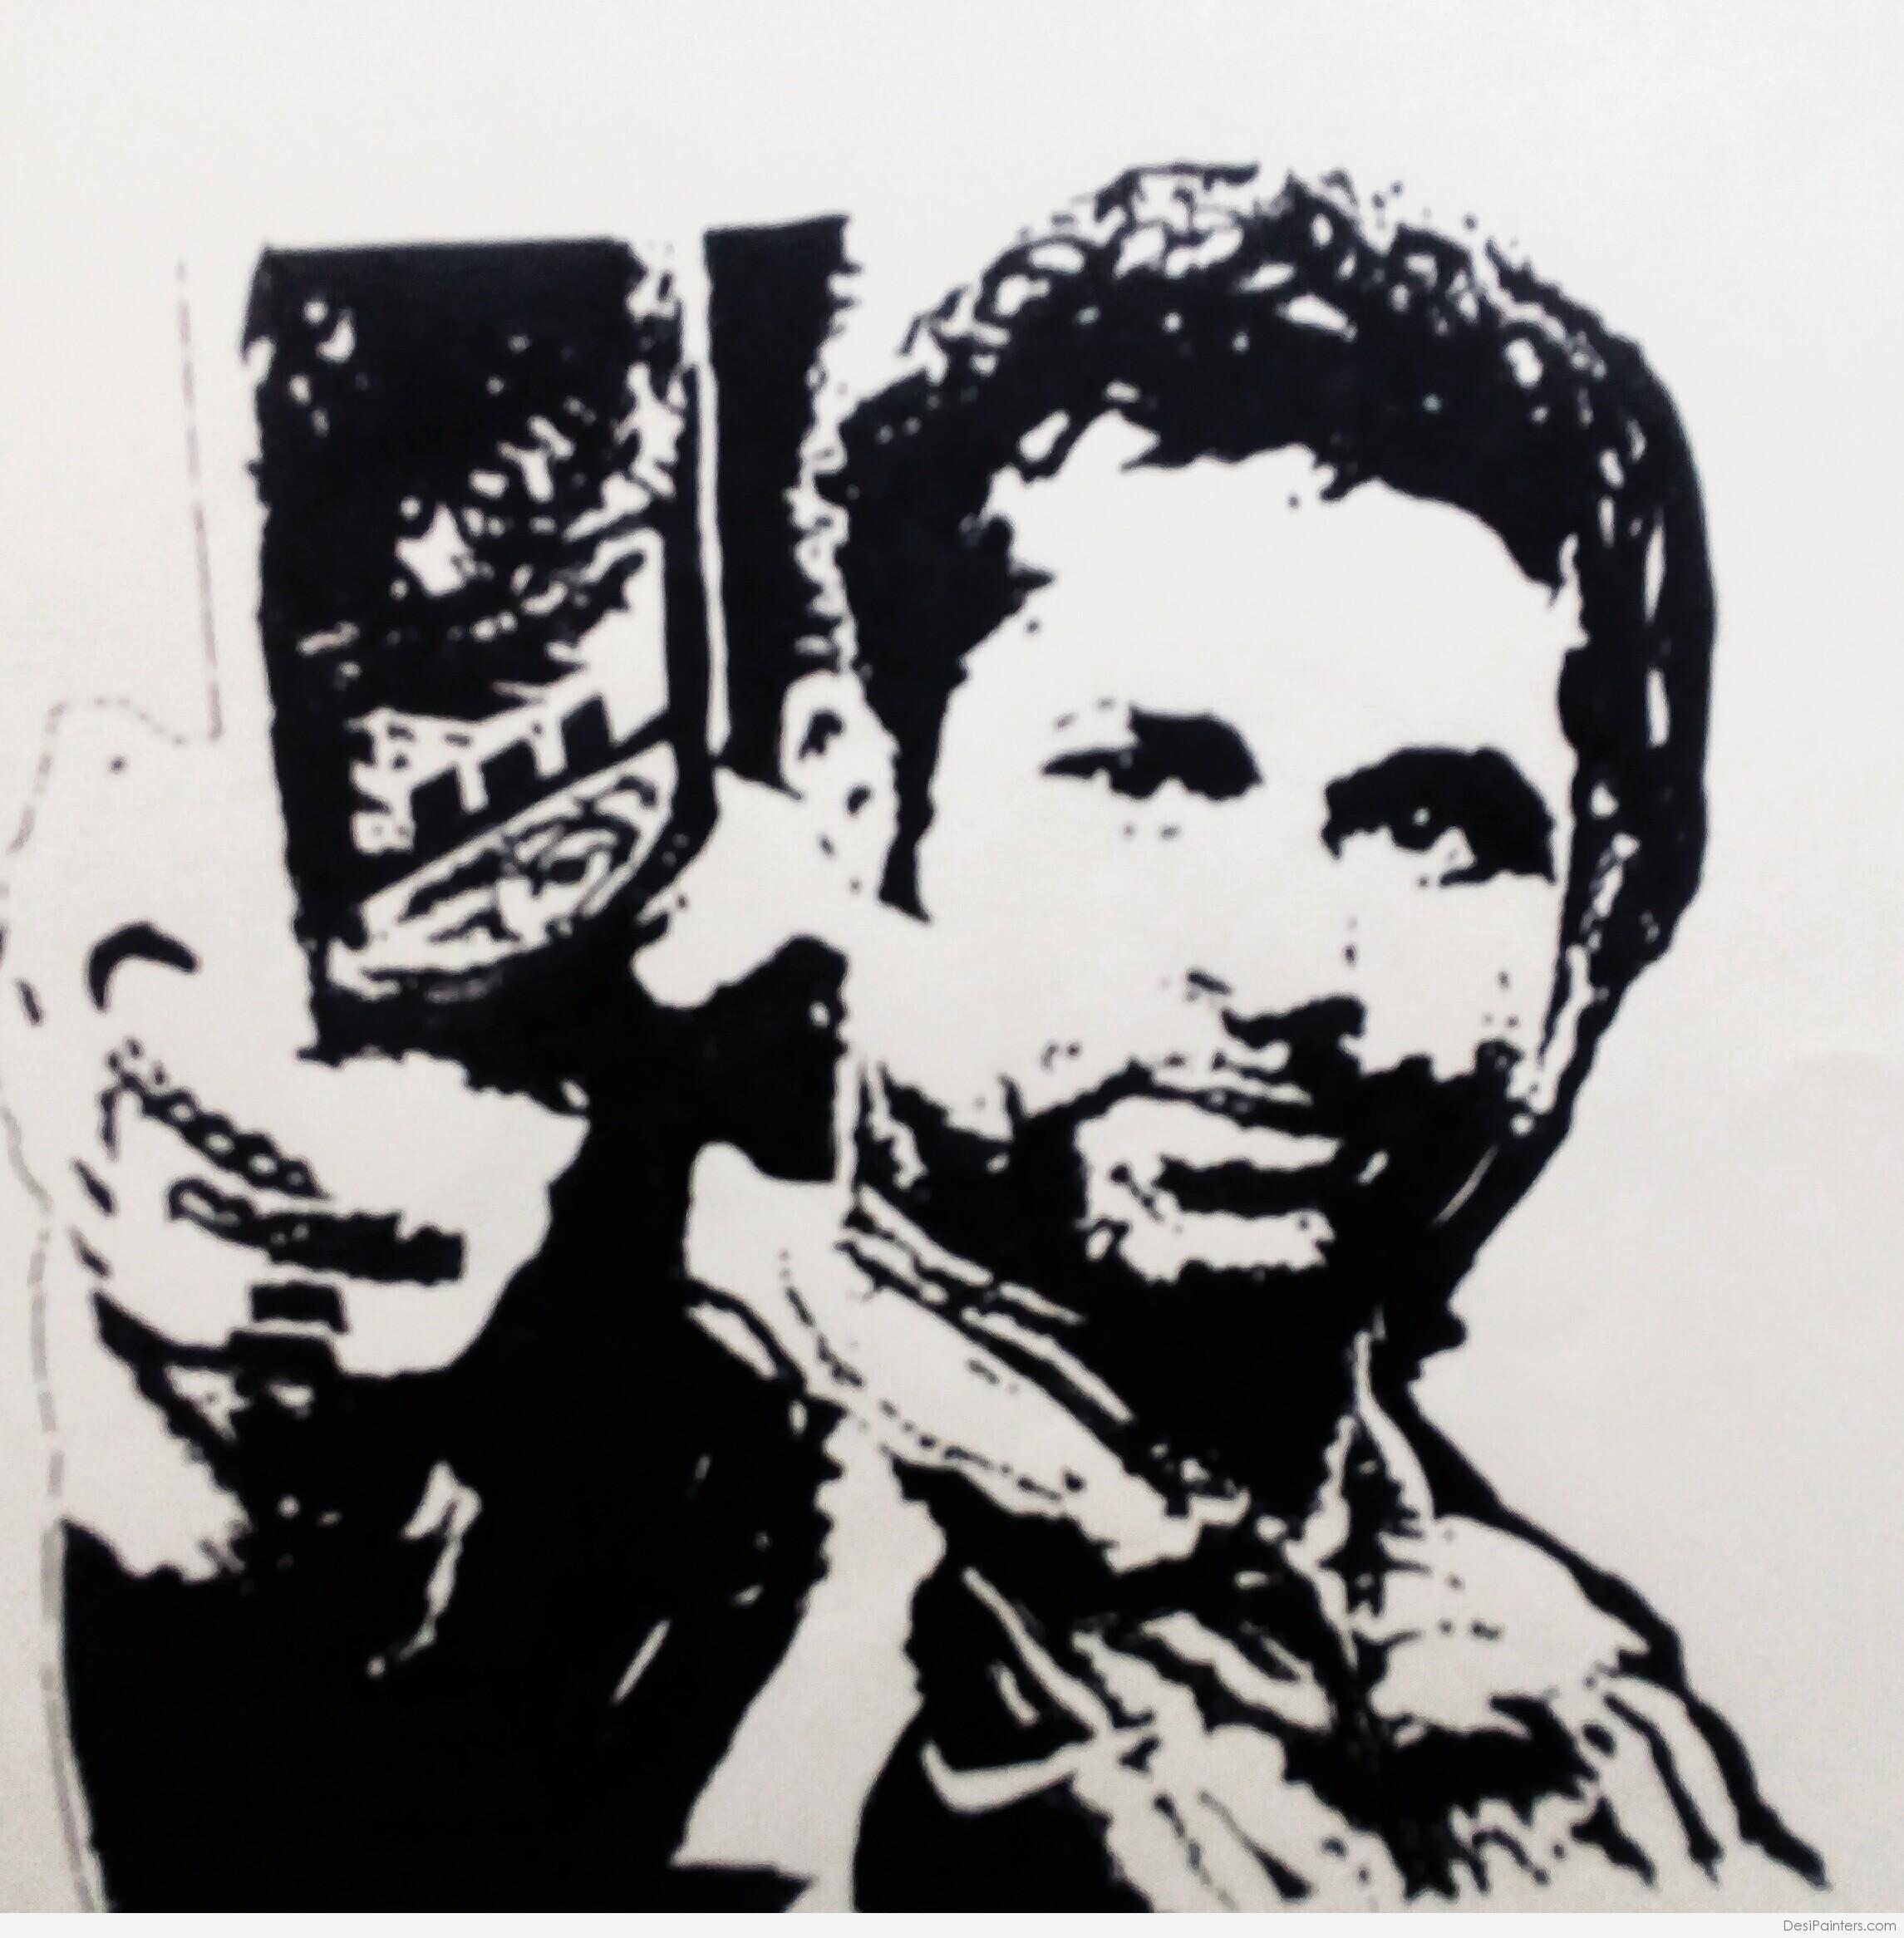 Shubham 3d Wallpaper Desi Painters Desipainters Com